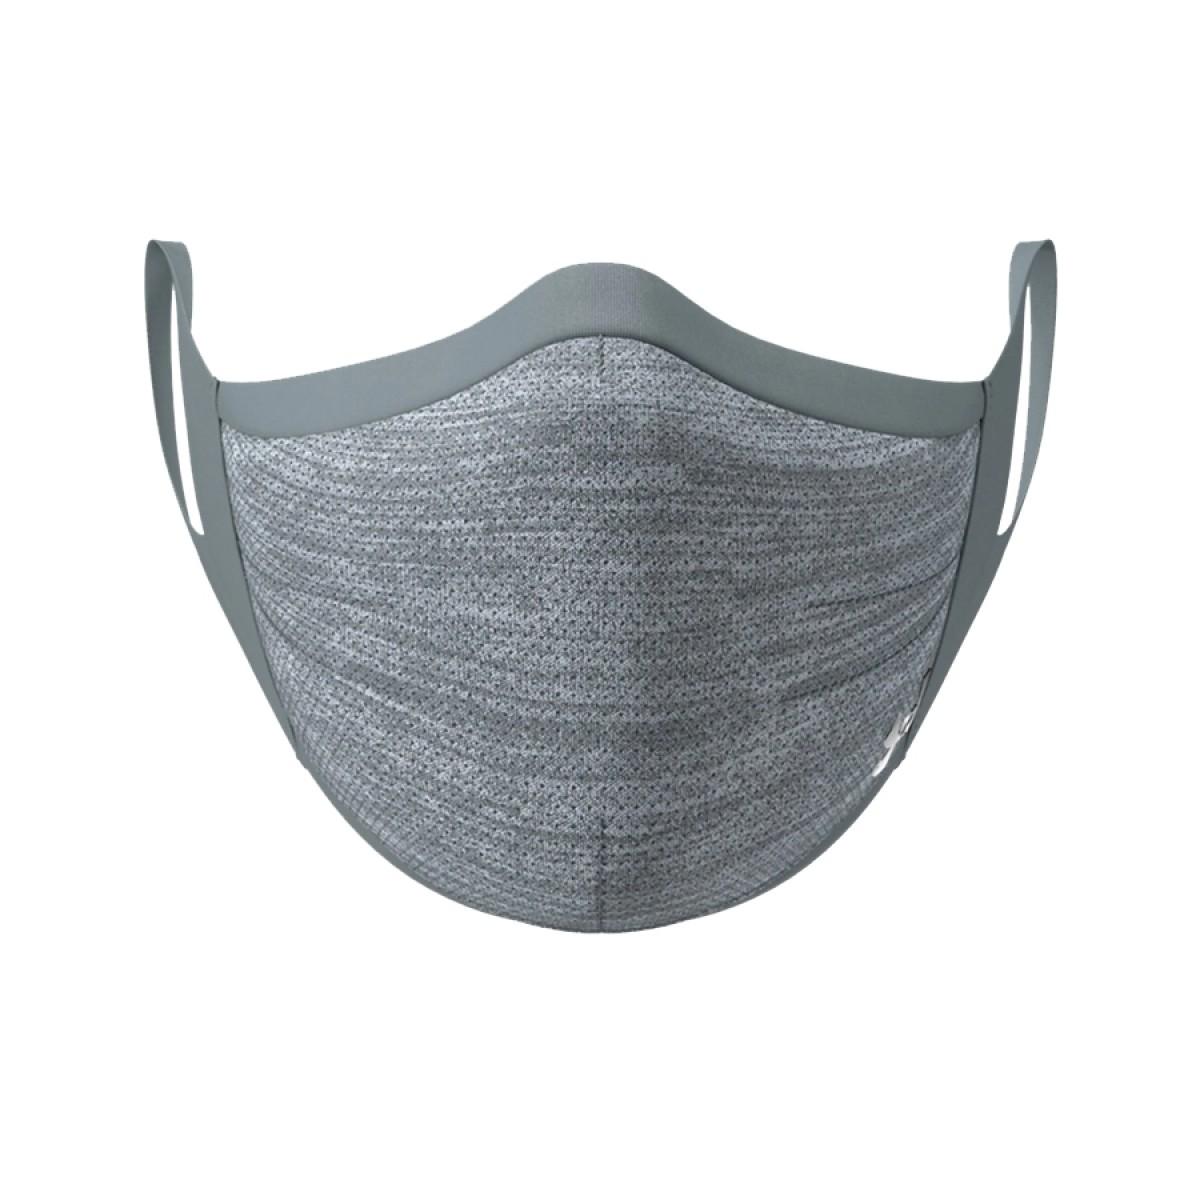 Under Armour SportsMask 'Grey'-1368010-013